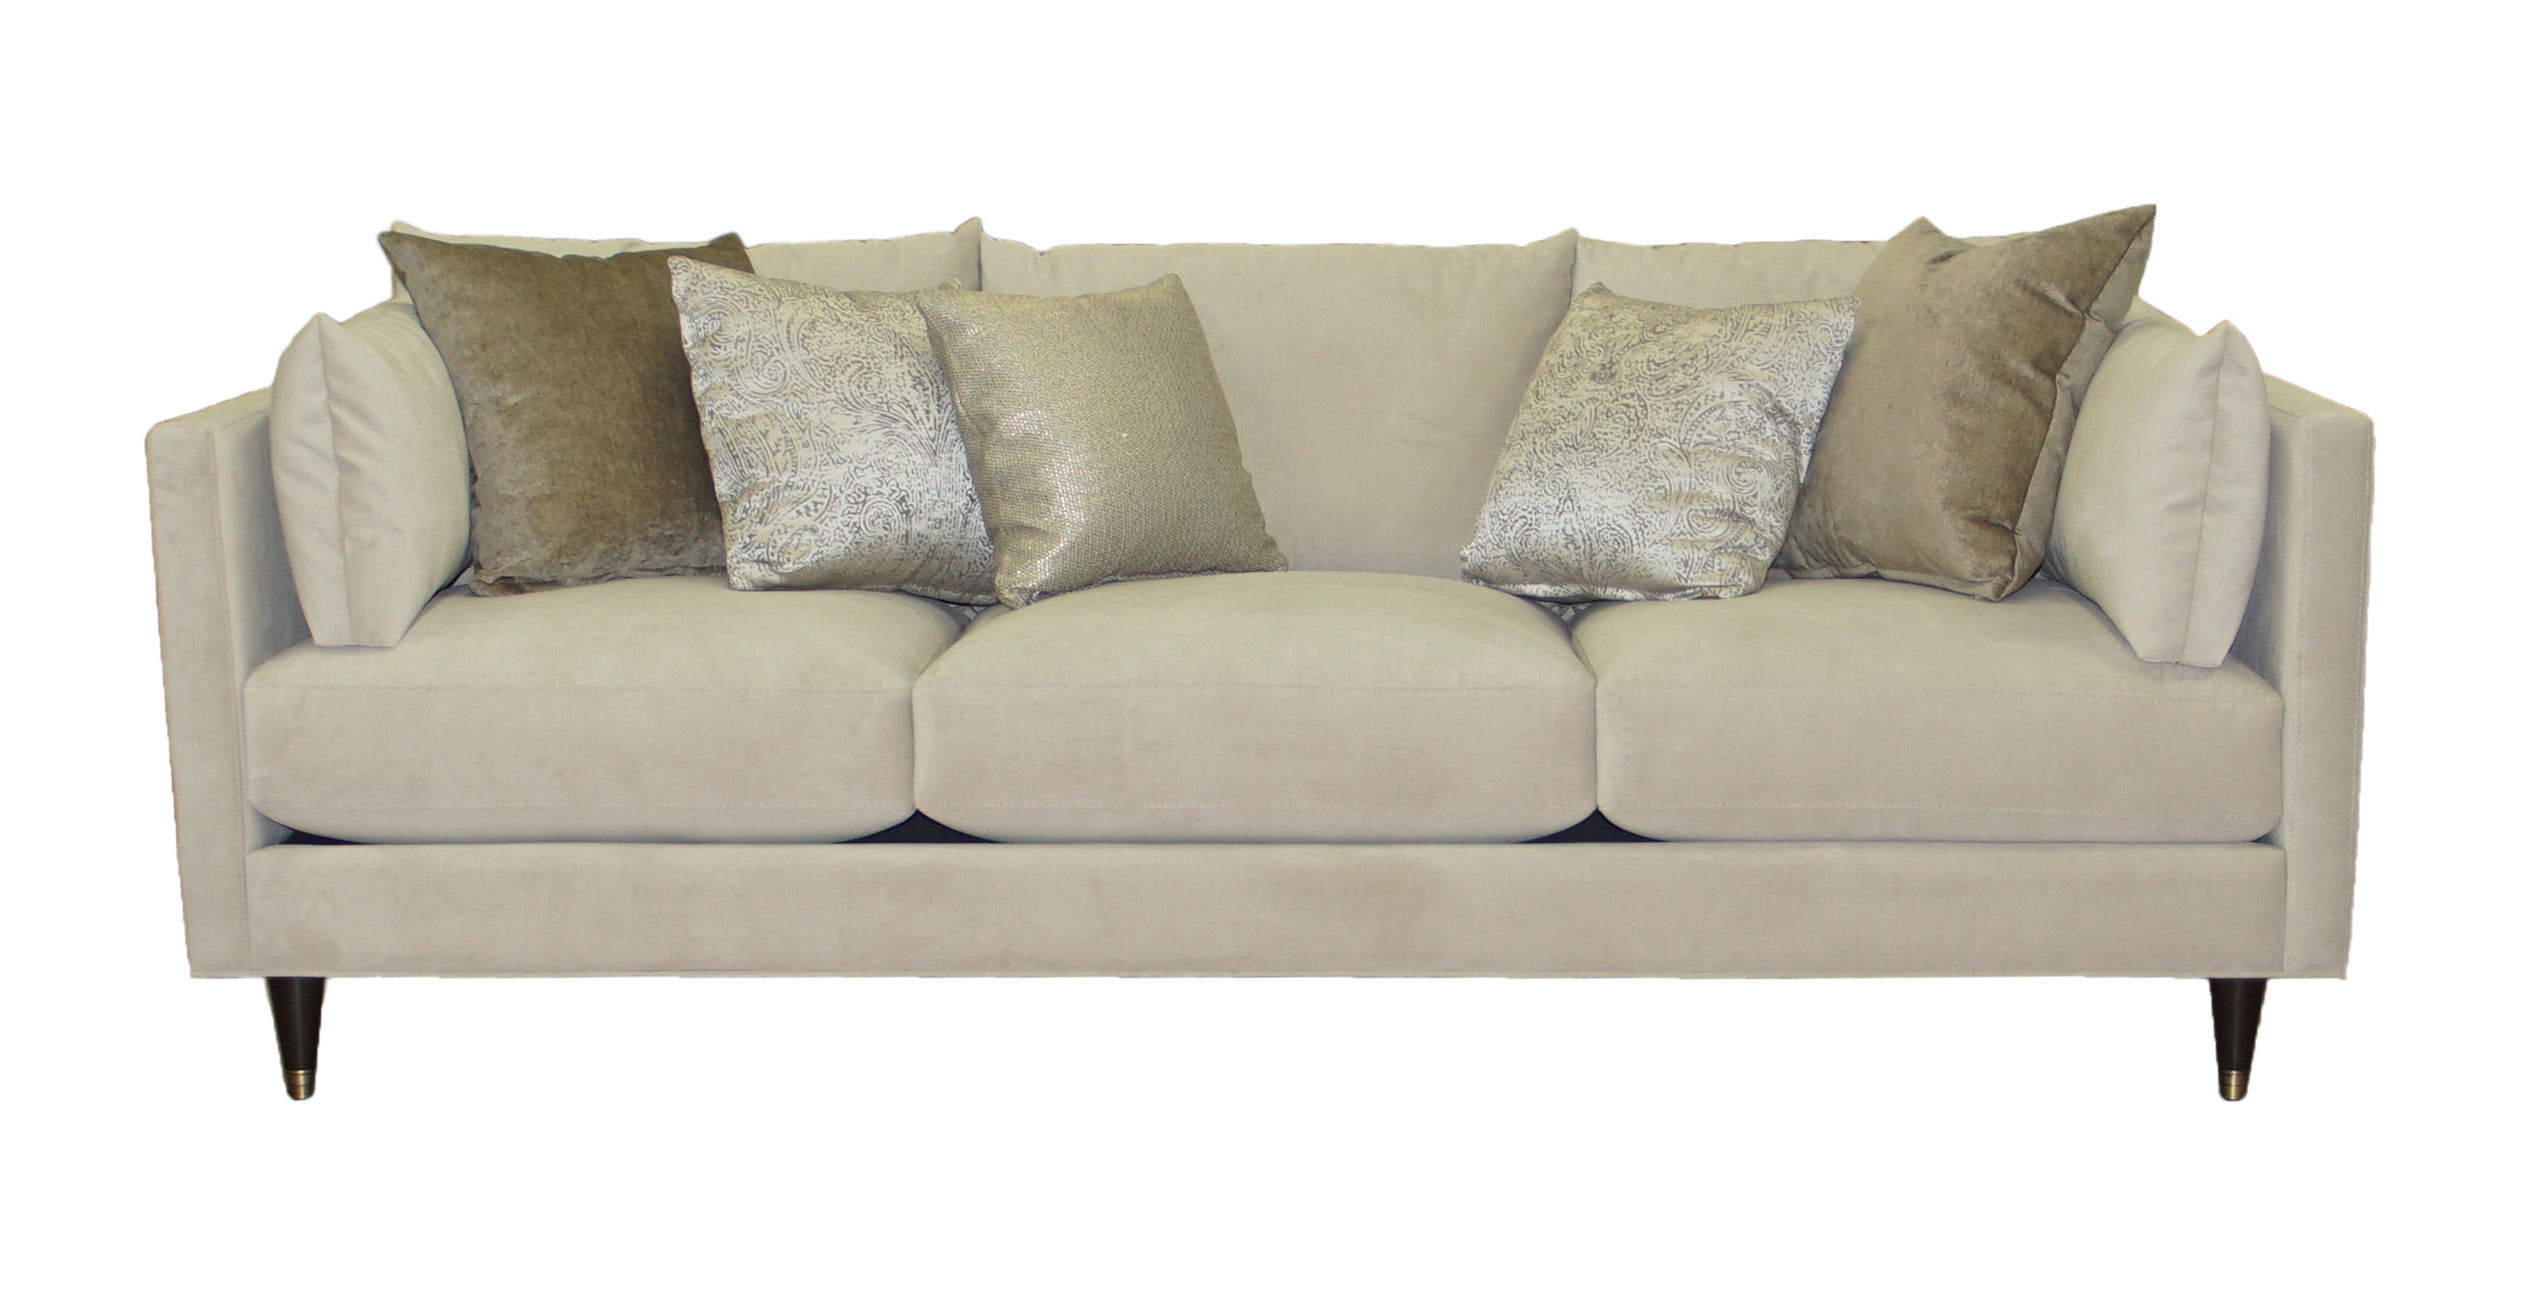 Fullsize Of Jonathan Louis Furniture